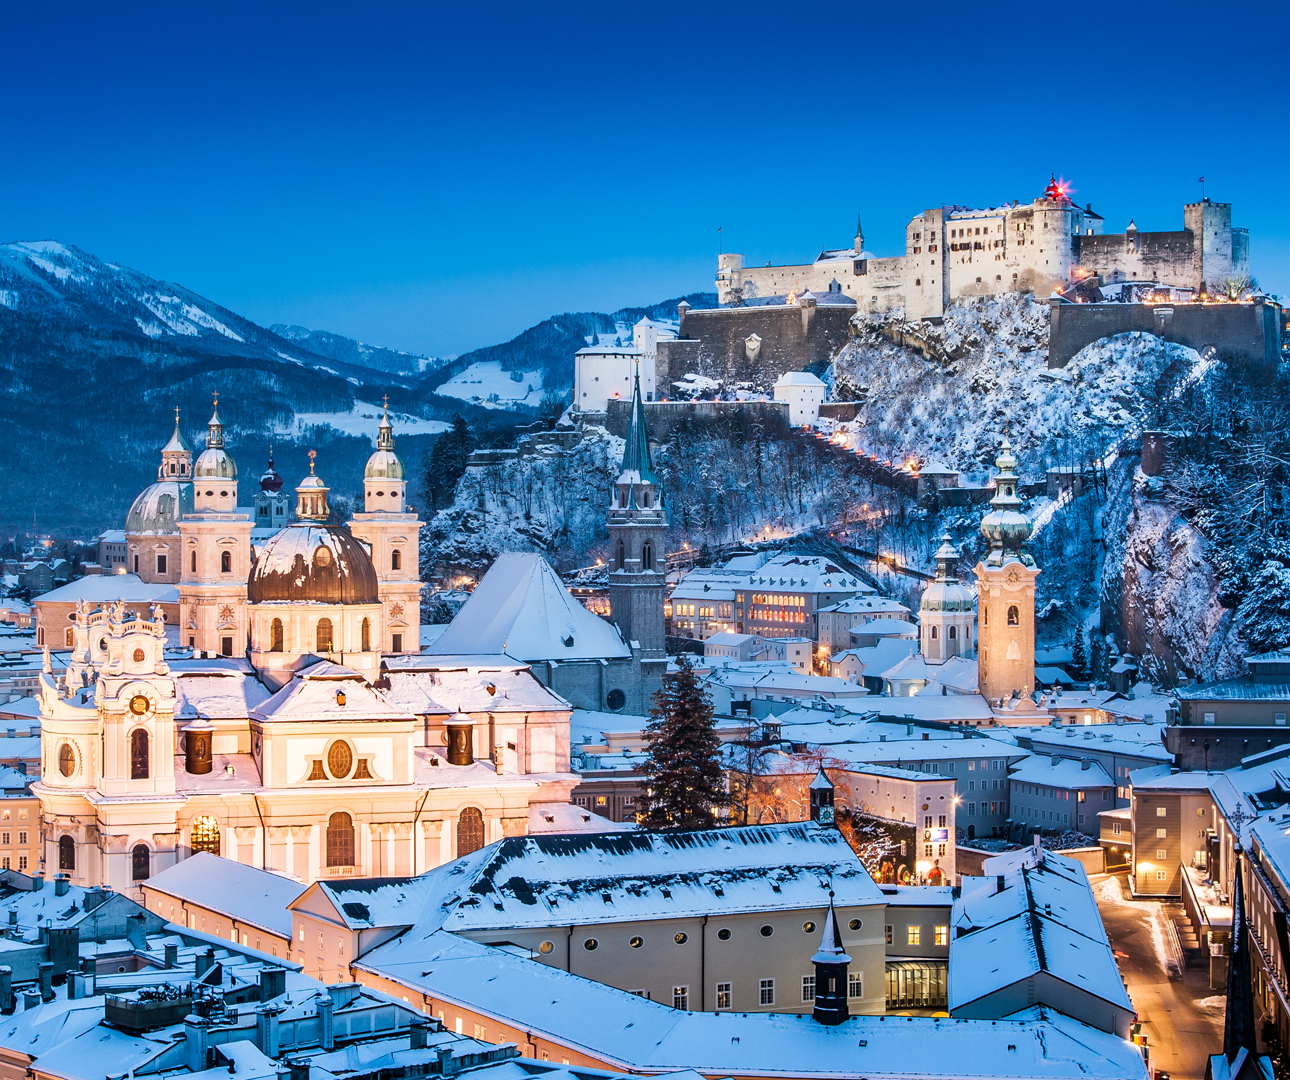 Historic-city-of-Salzburg-in-winter-iStock-bluejayphoto-www.istockphoto